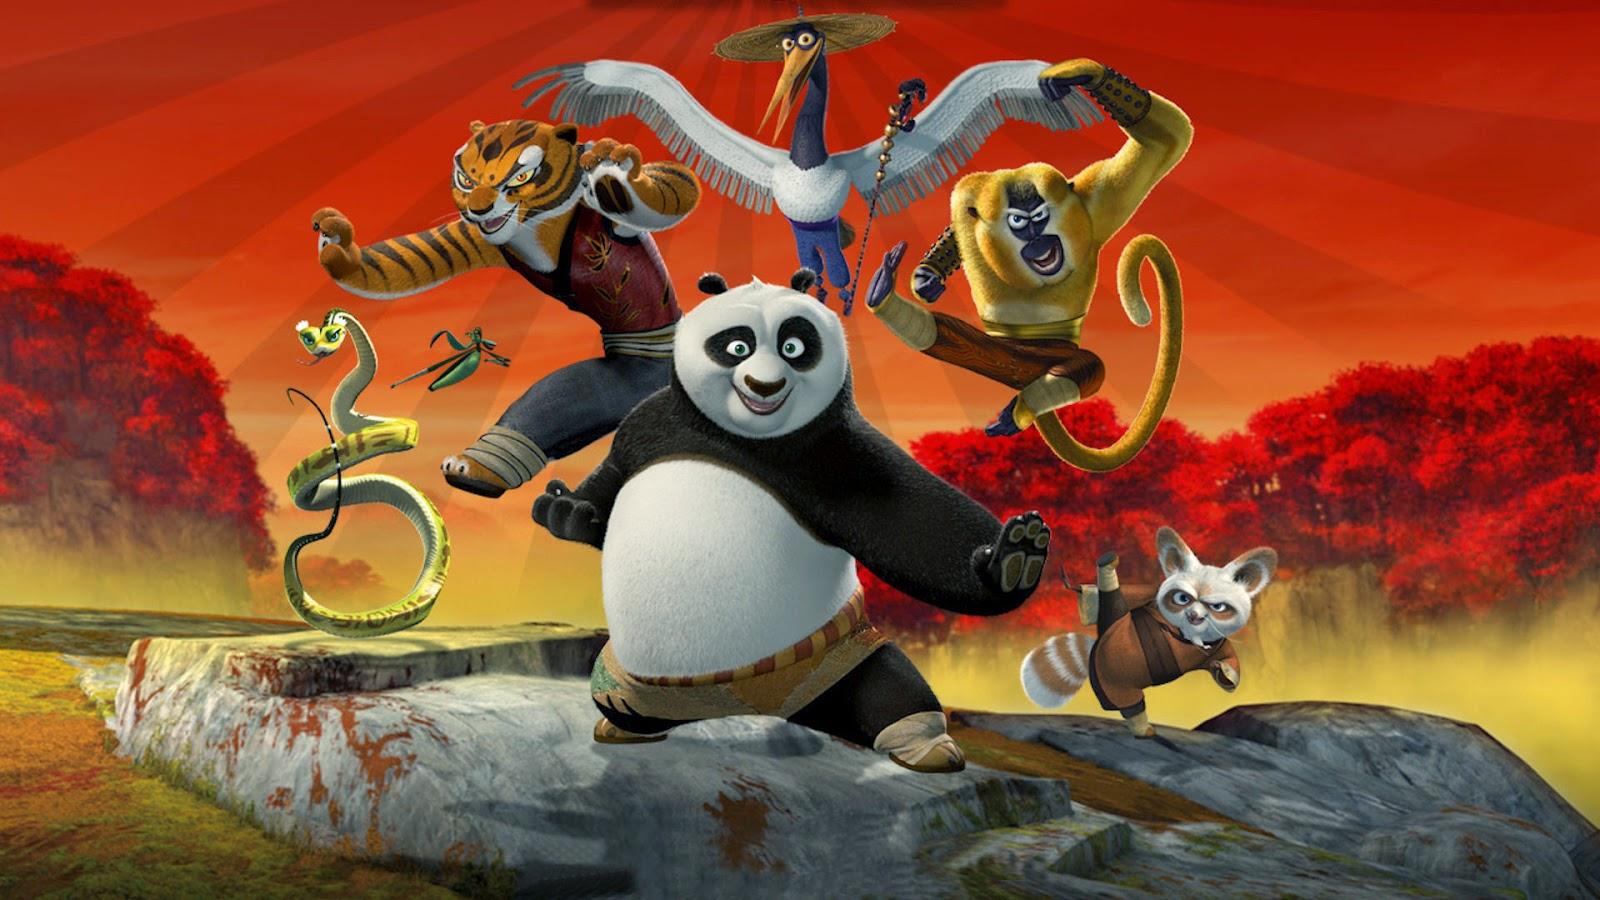 Panda Background Lucu Related Keywords Suggestions Panda